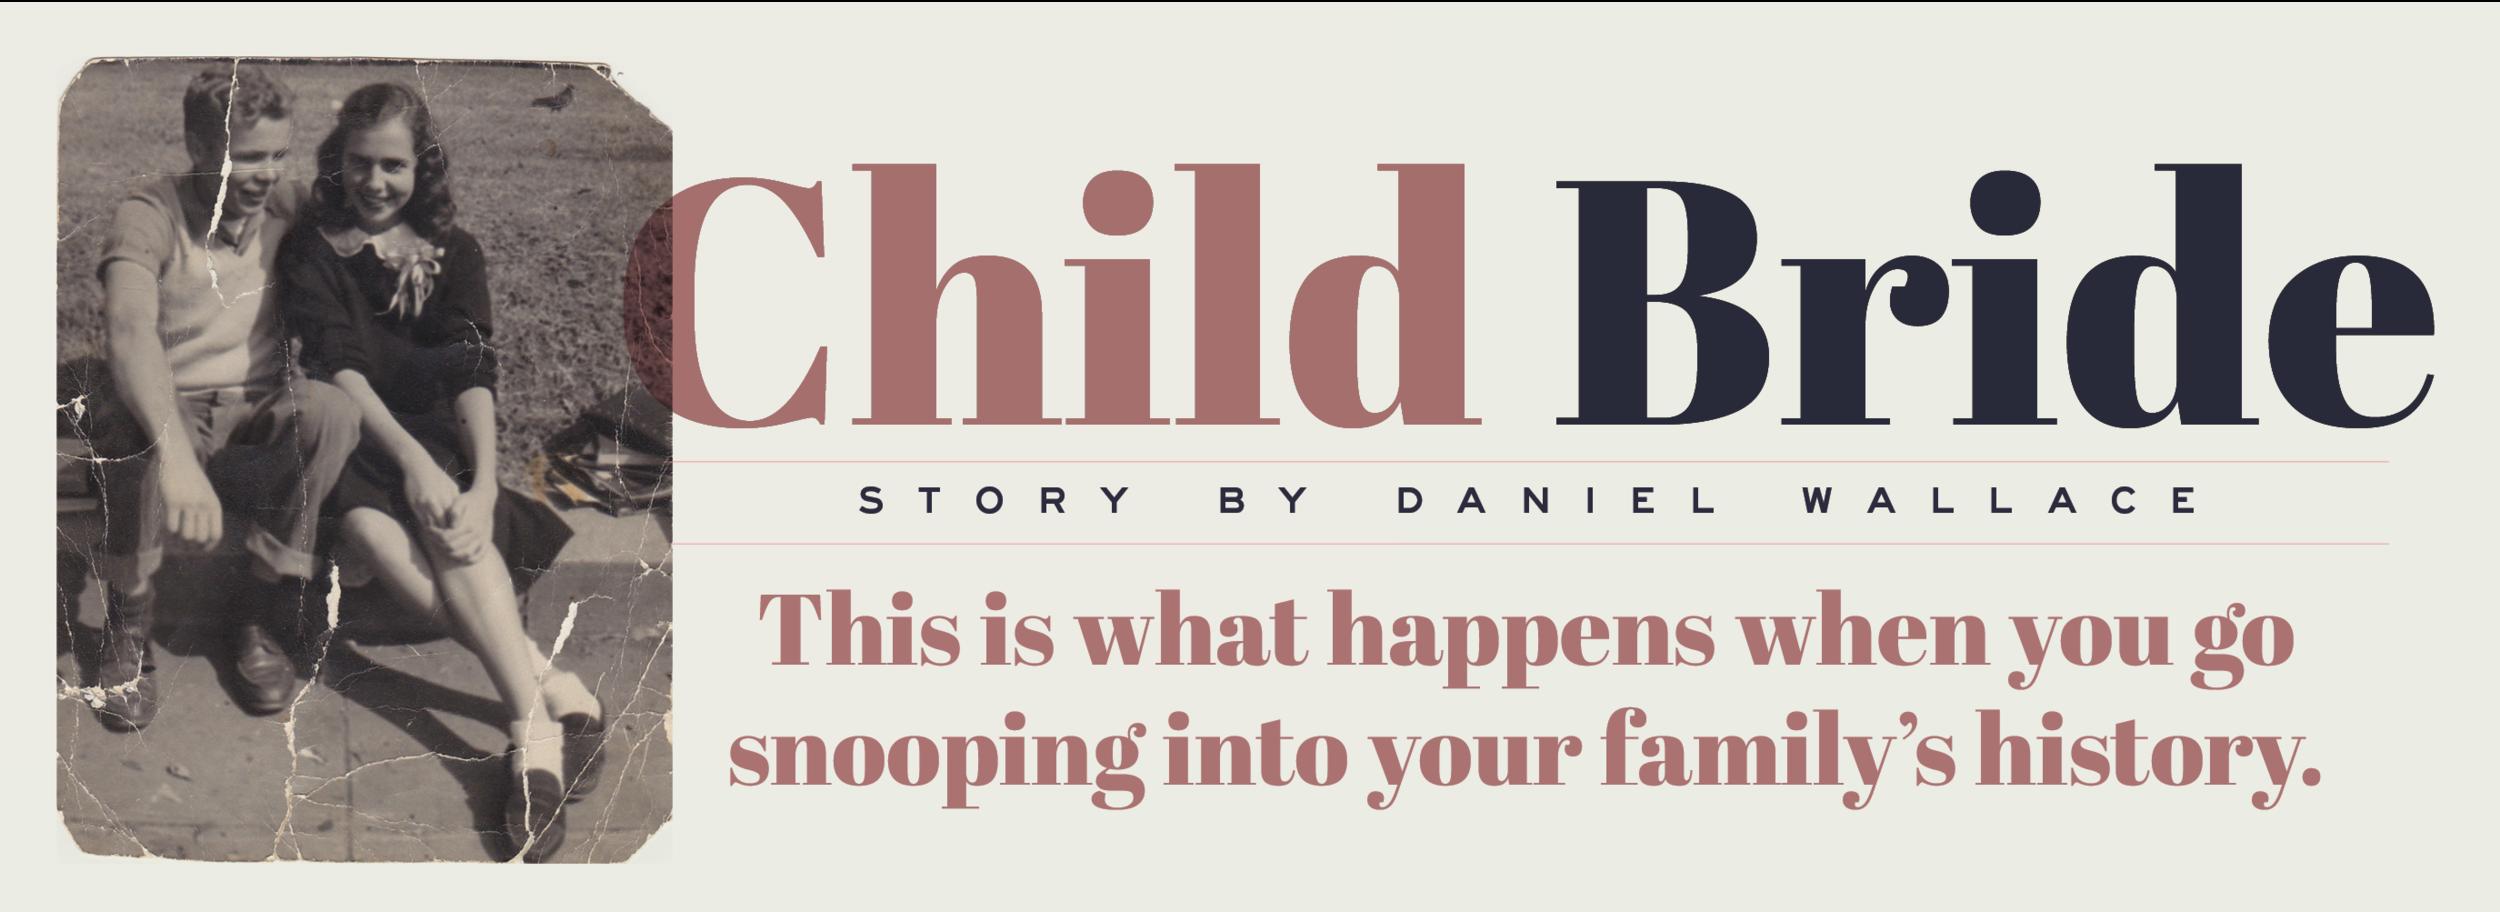 child-bride-archive.png